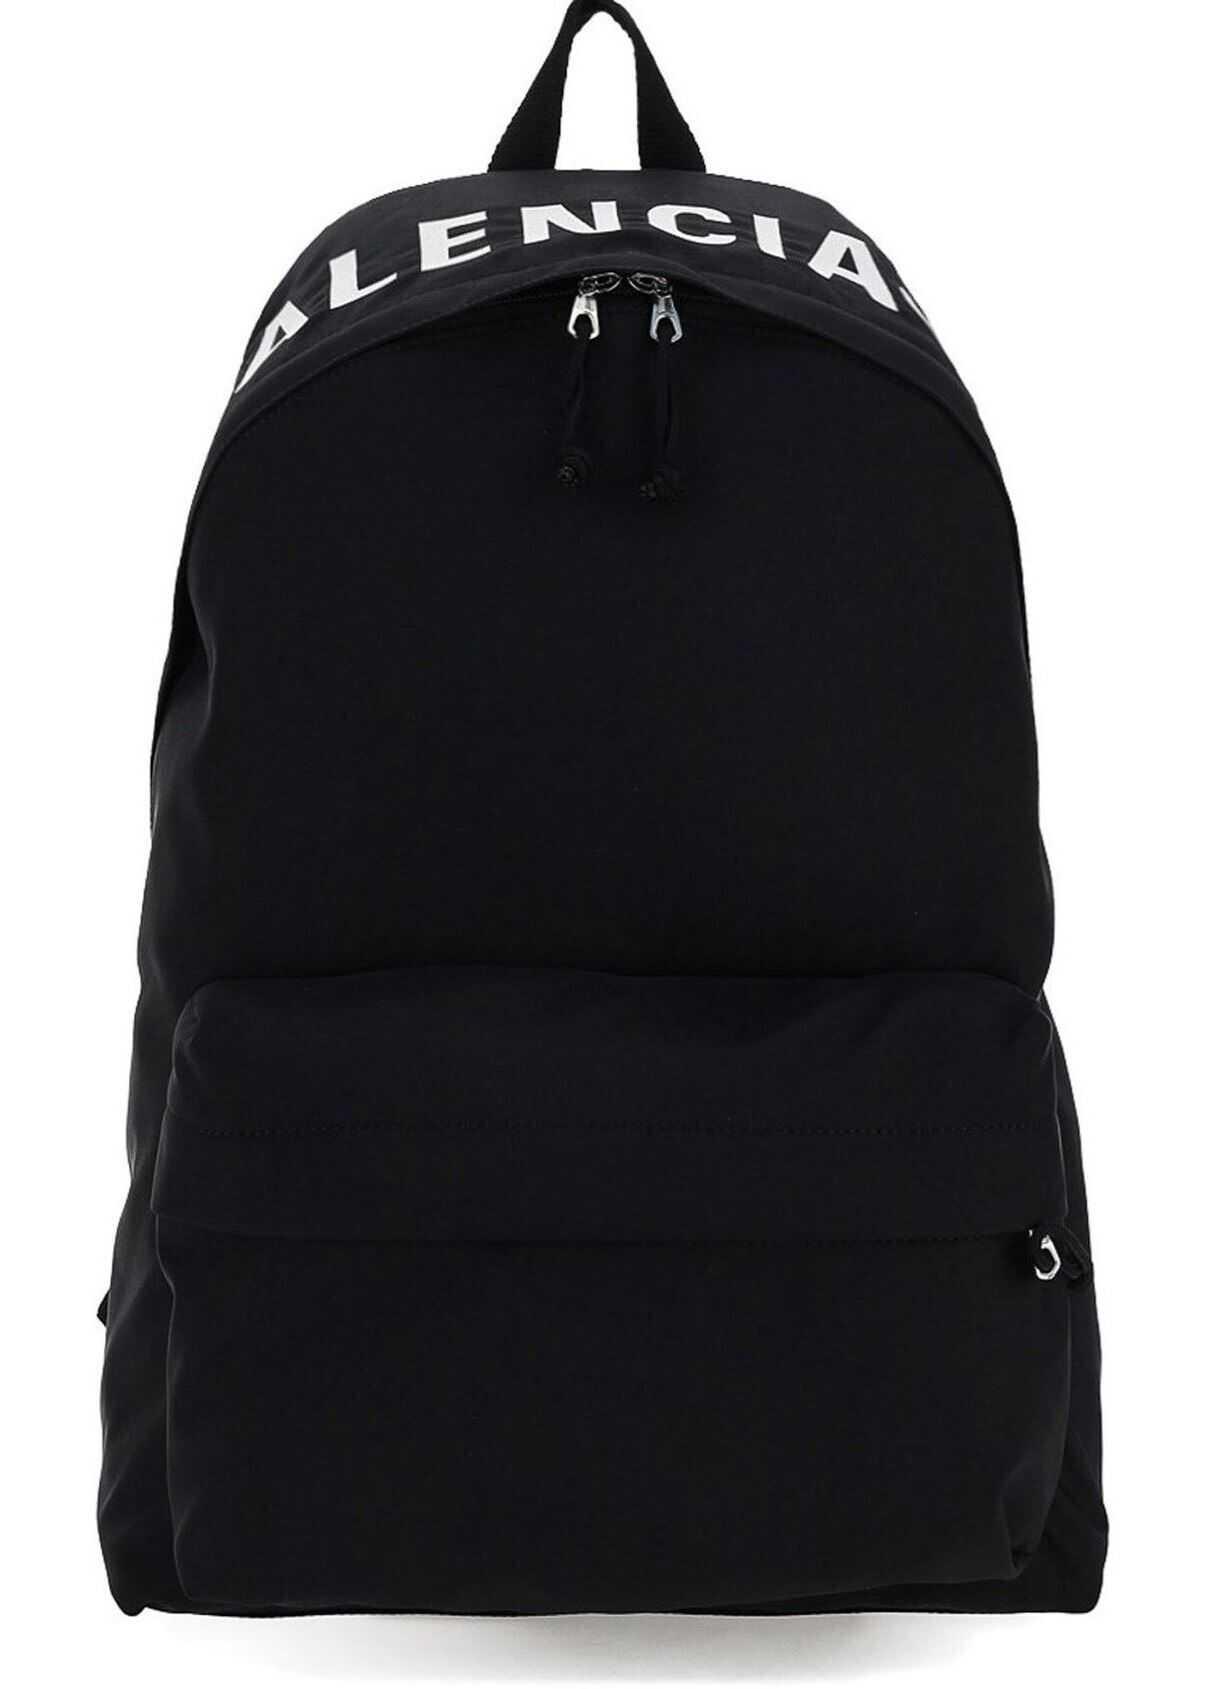 Balenciaga Logo Embroidery Backpack In Black 507460H853X1060 Black imagine b-mall.ro